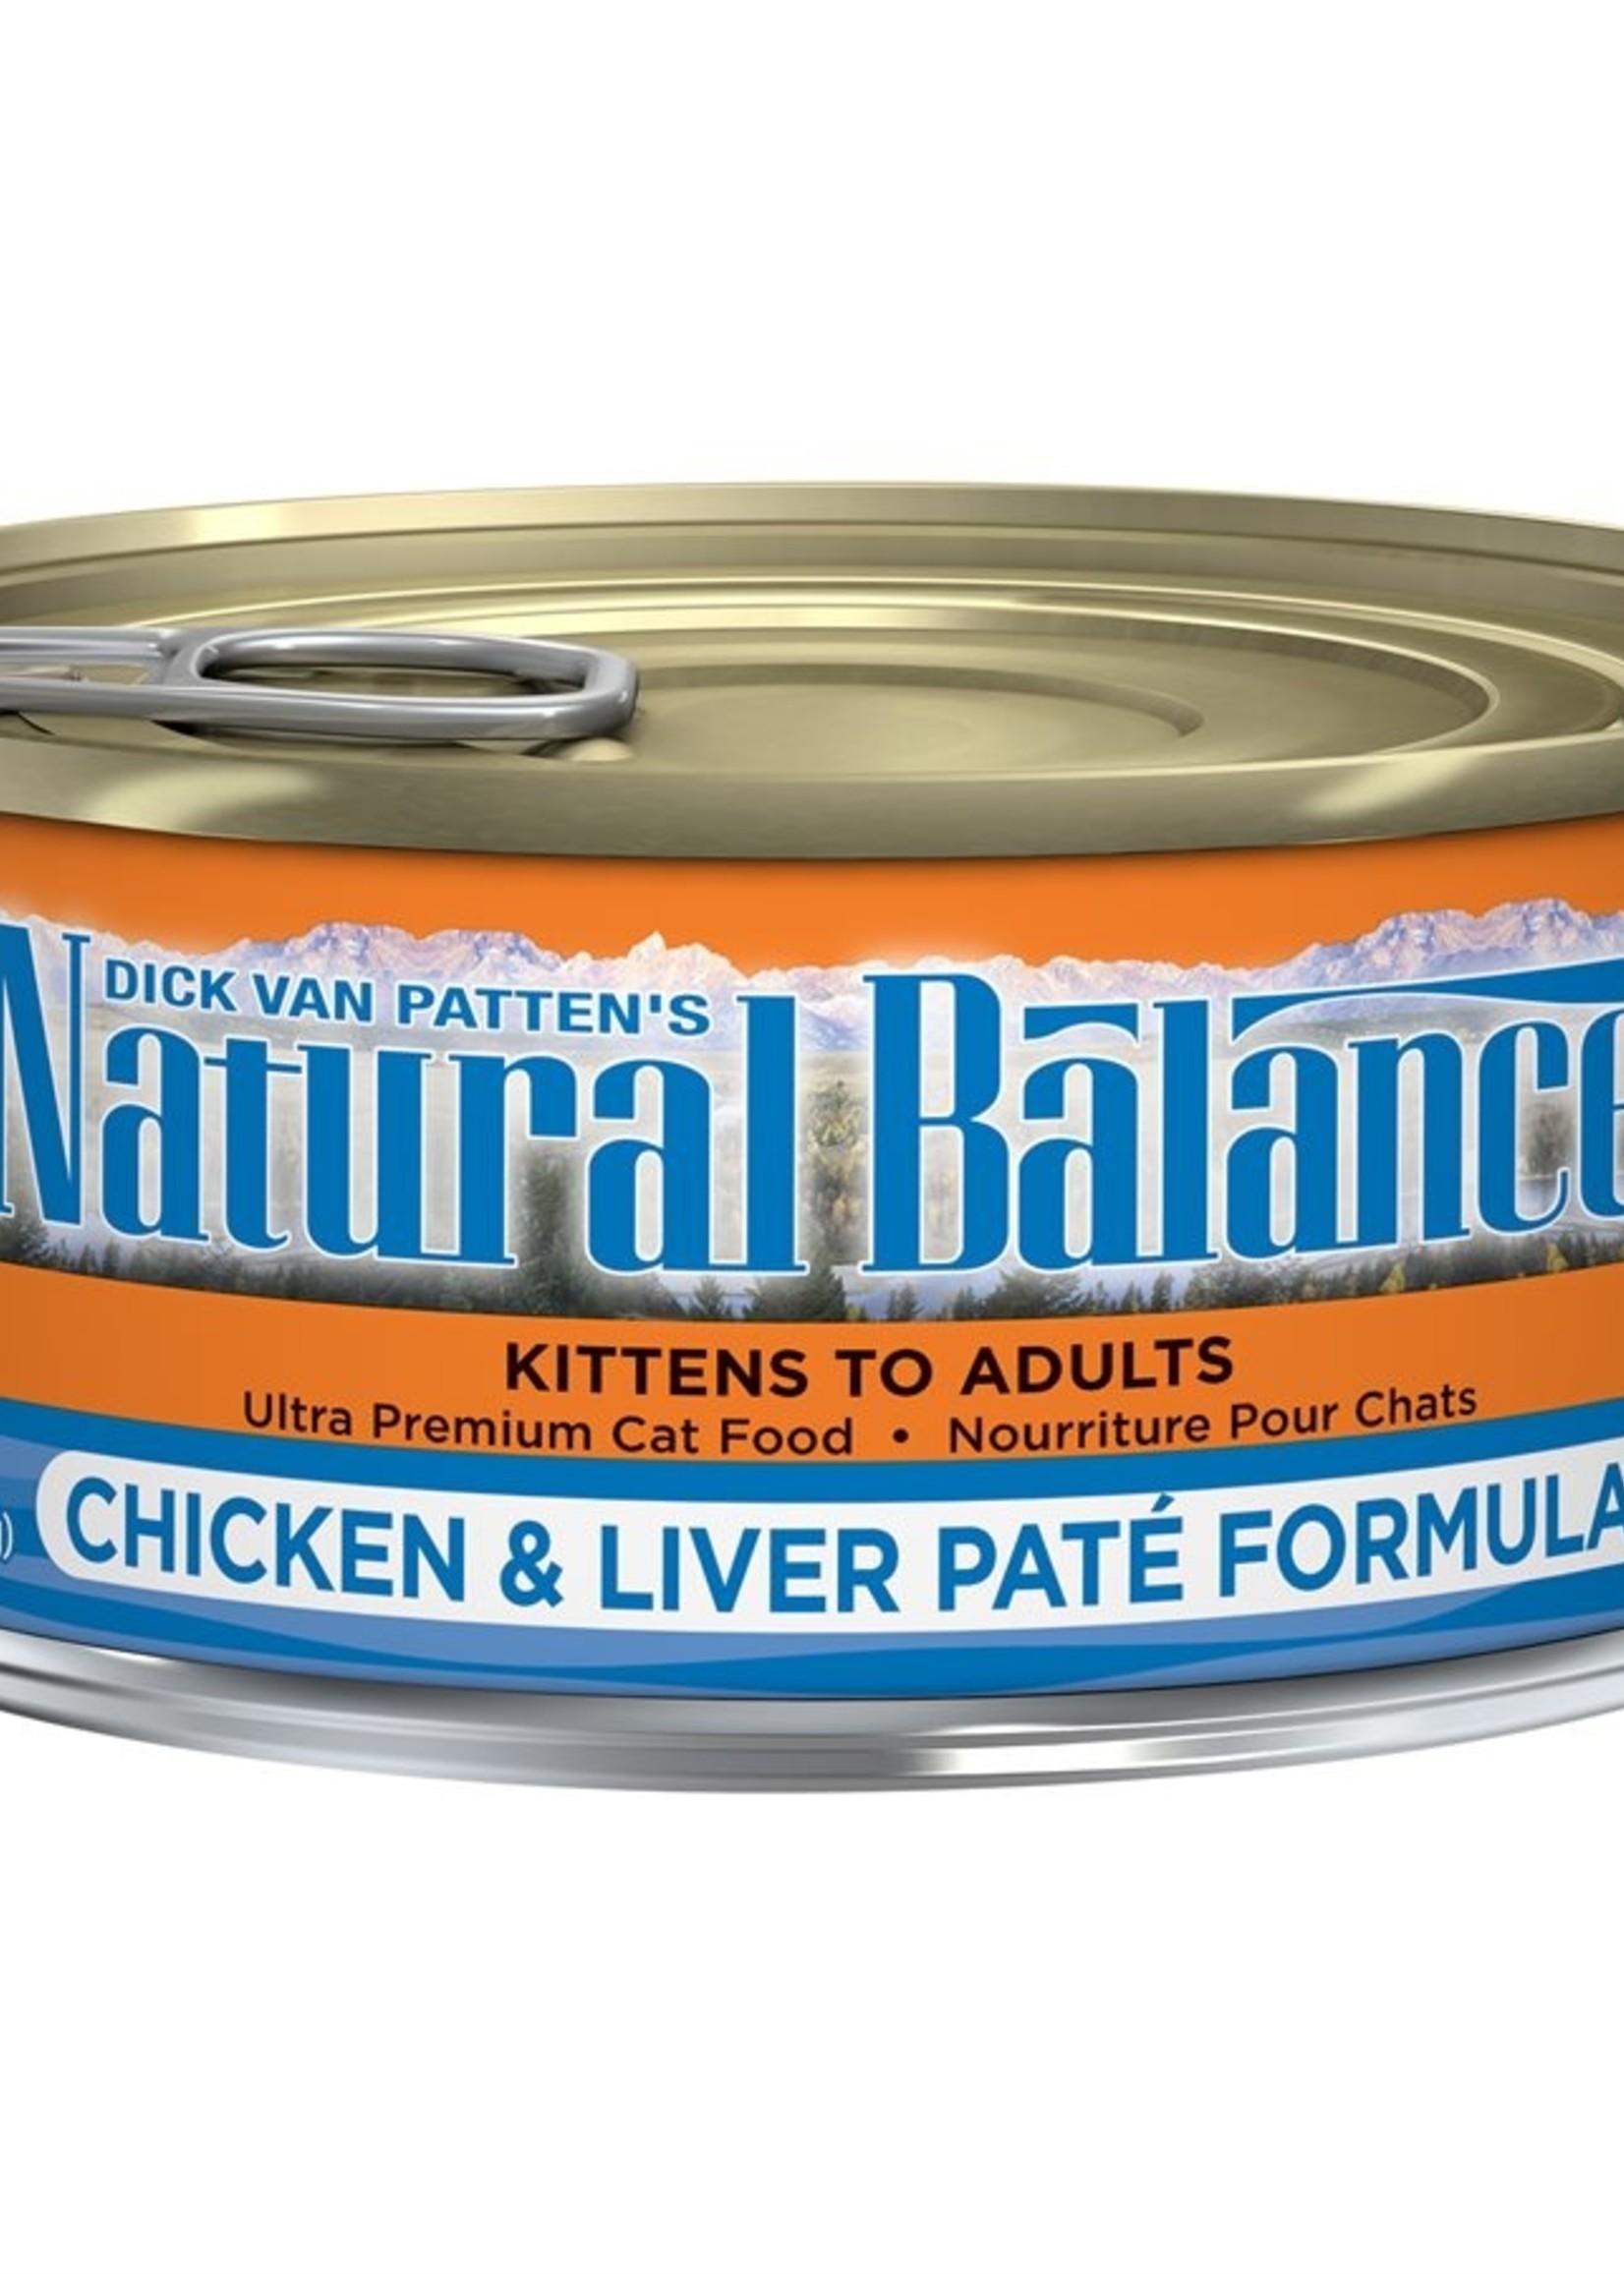 Natural Balance® Natural Balance Chicken & Liver Pâté Formula 5.5oz